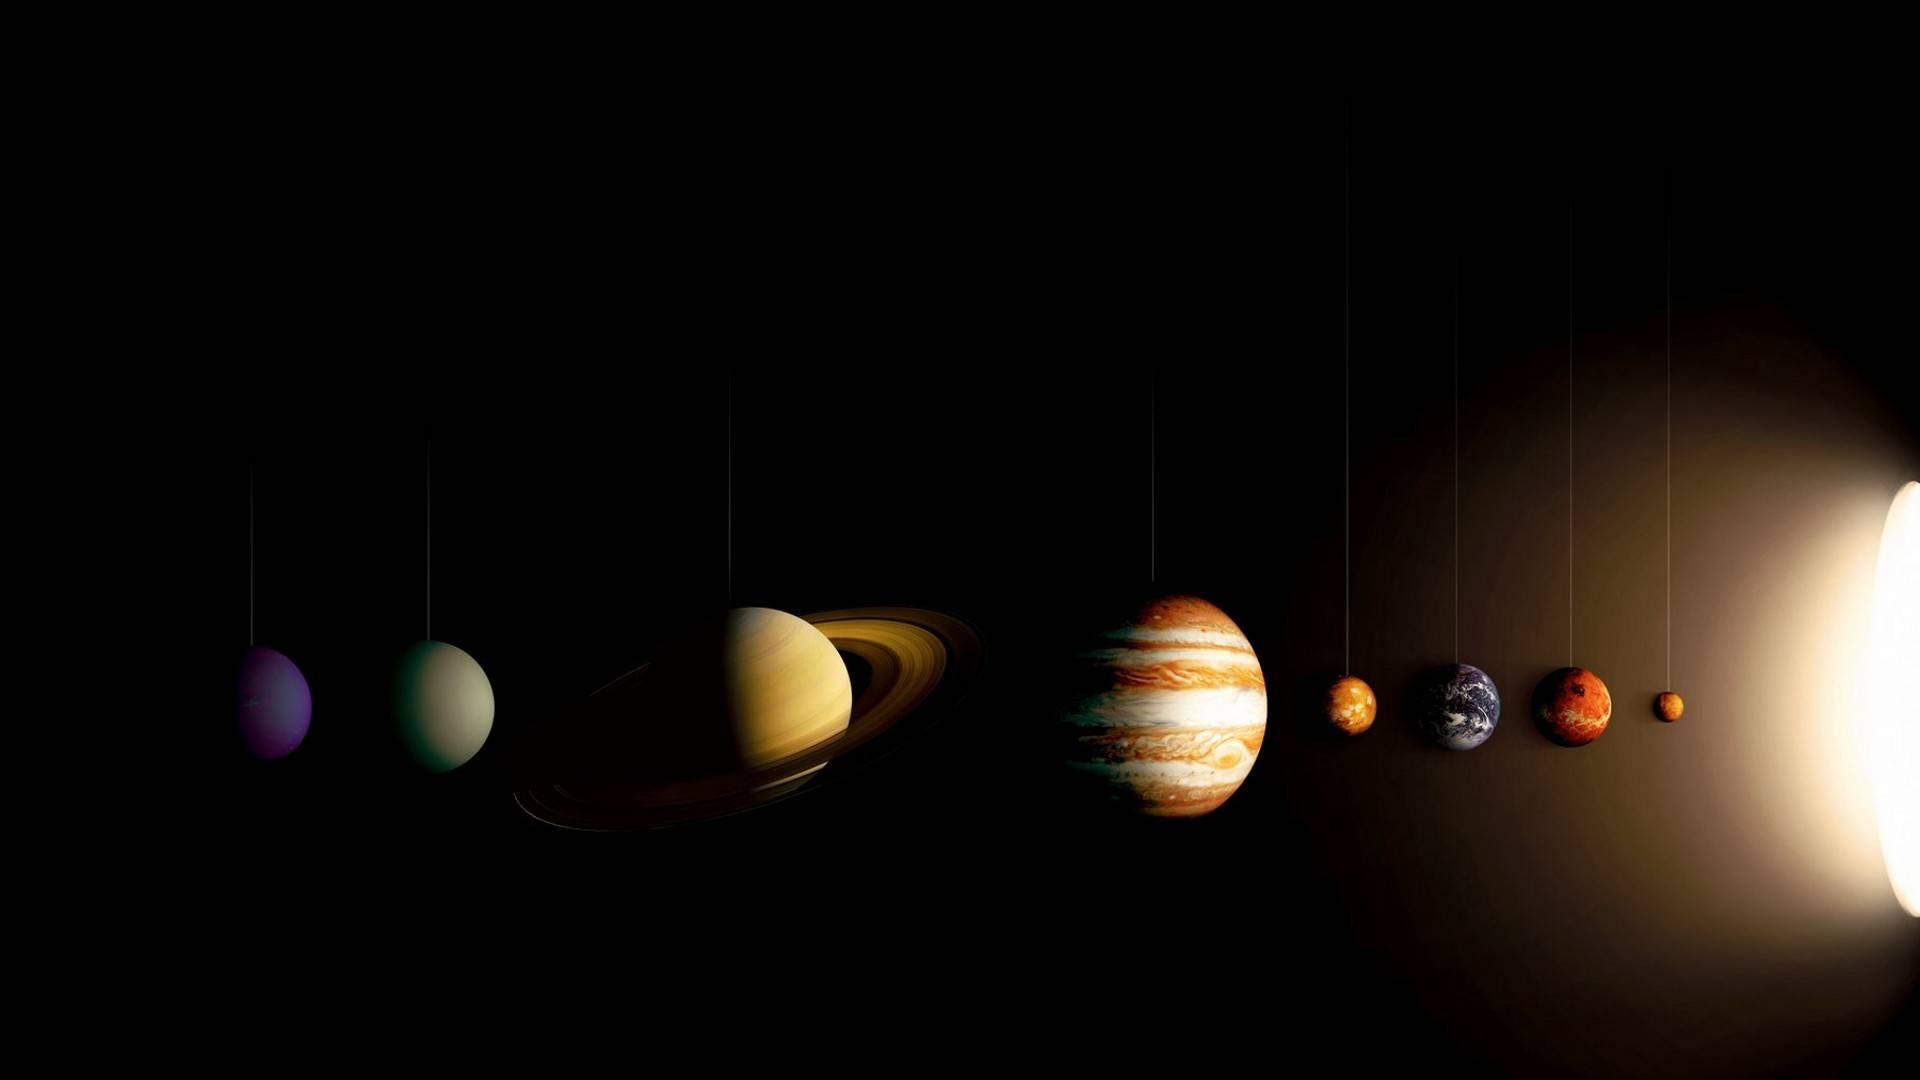 solar system desktop backgrounds - photo #39